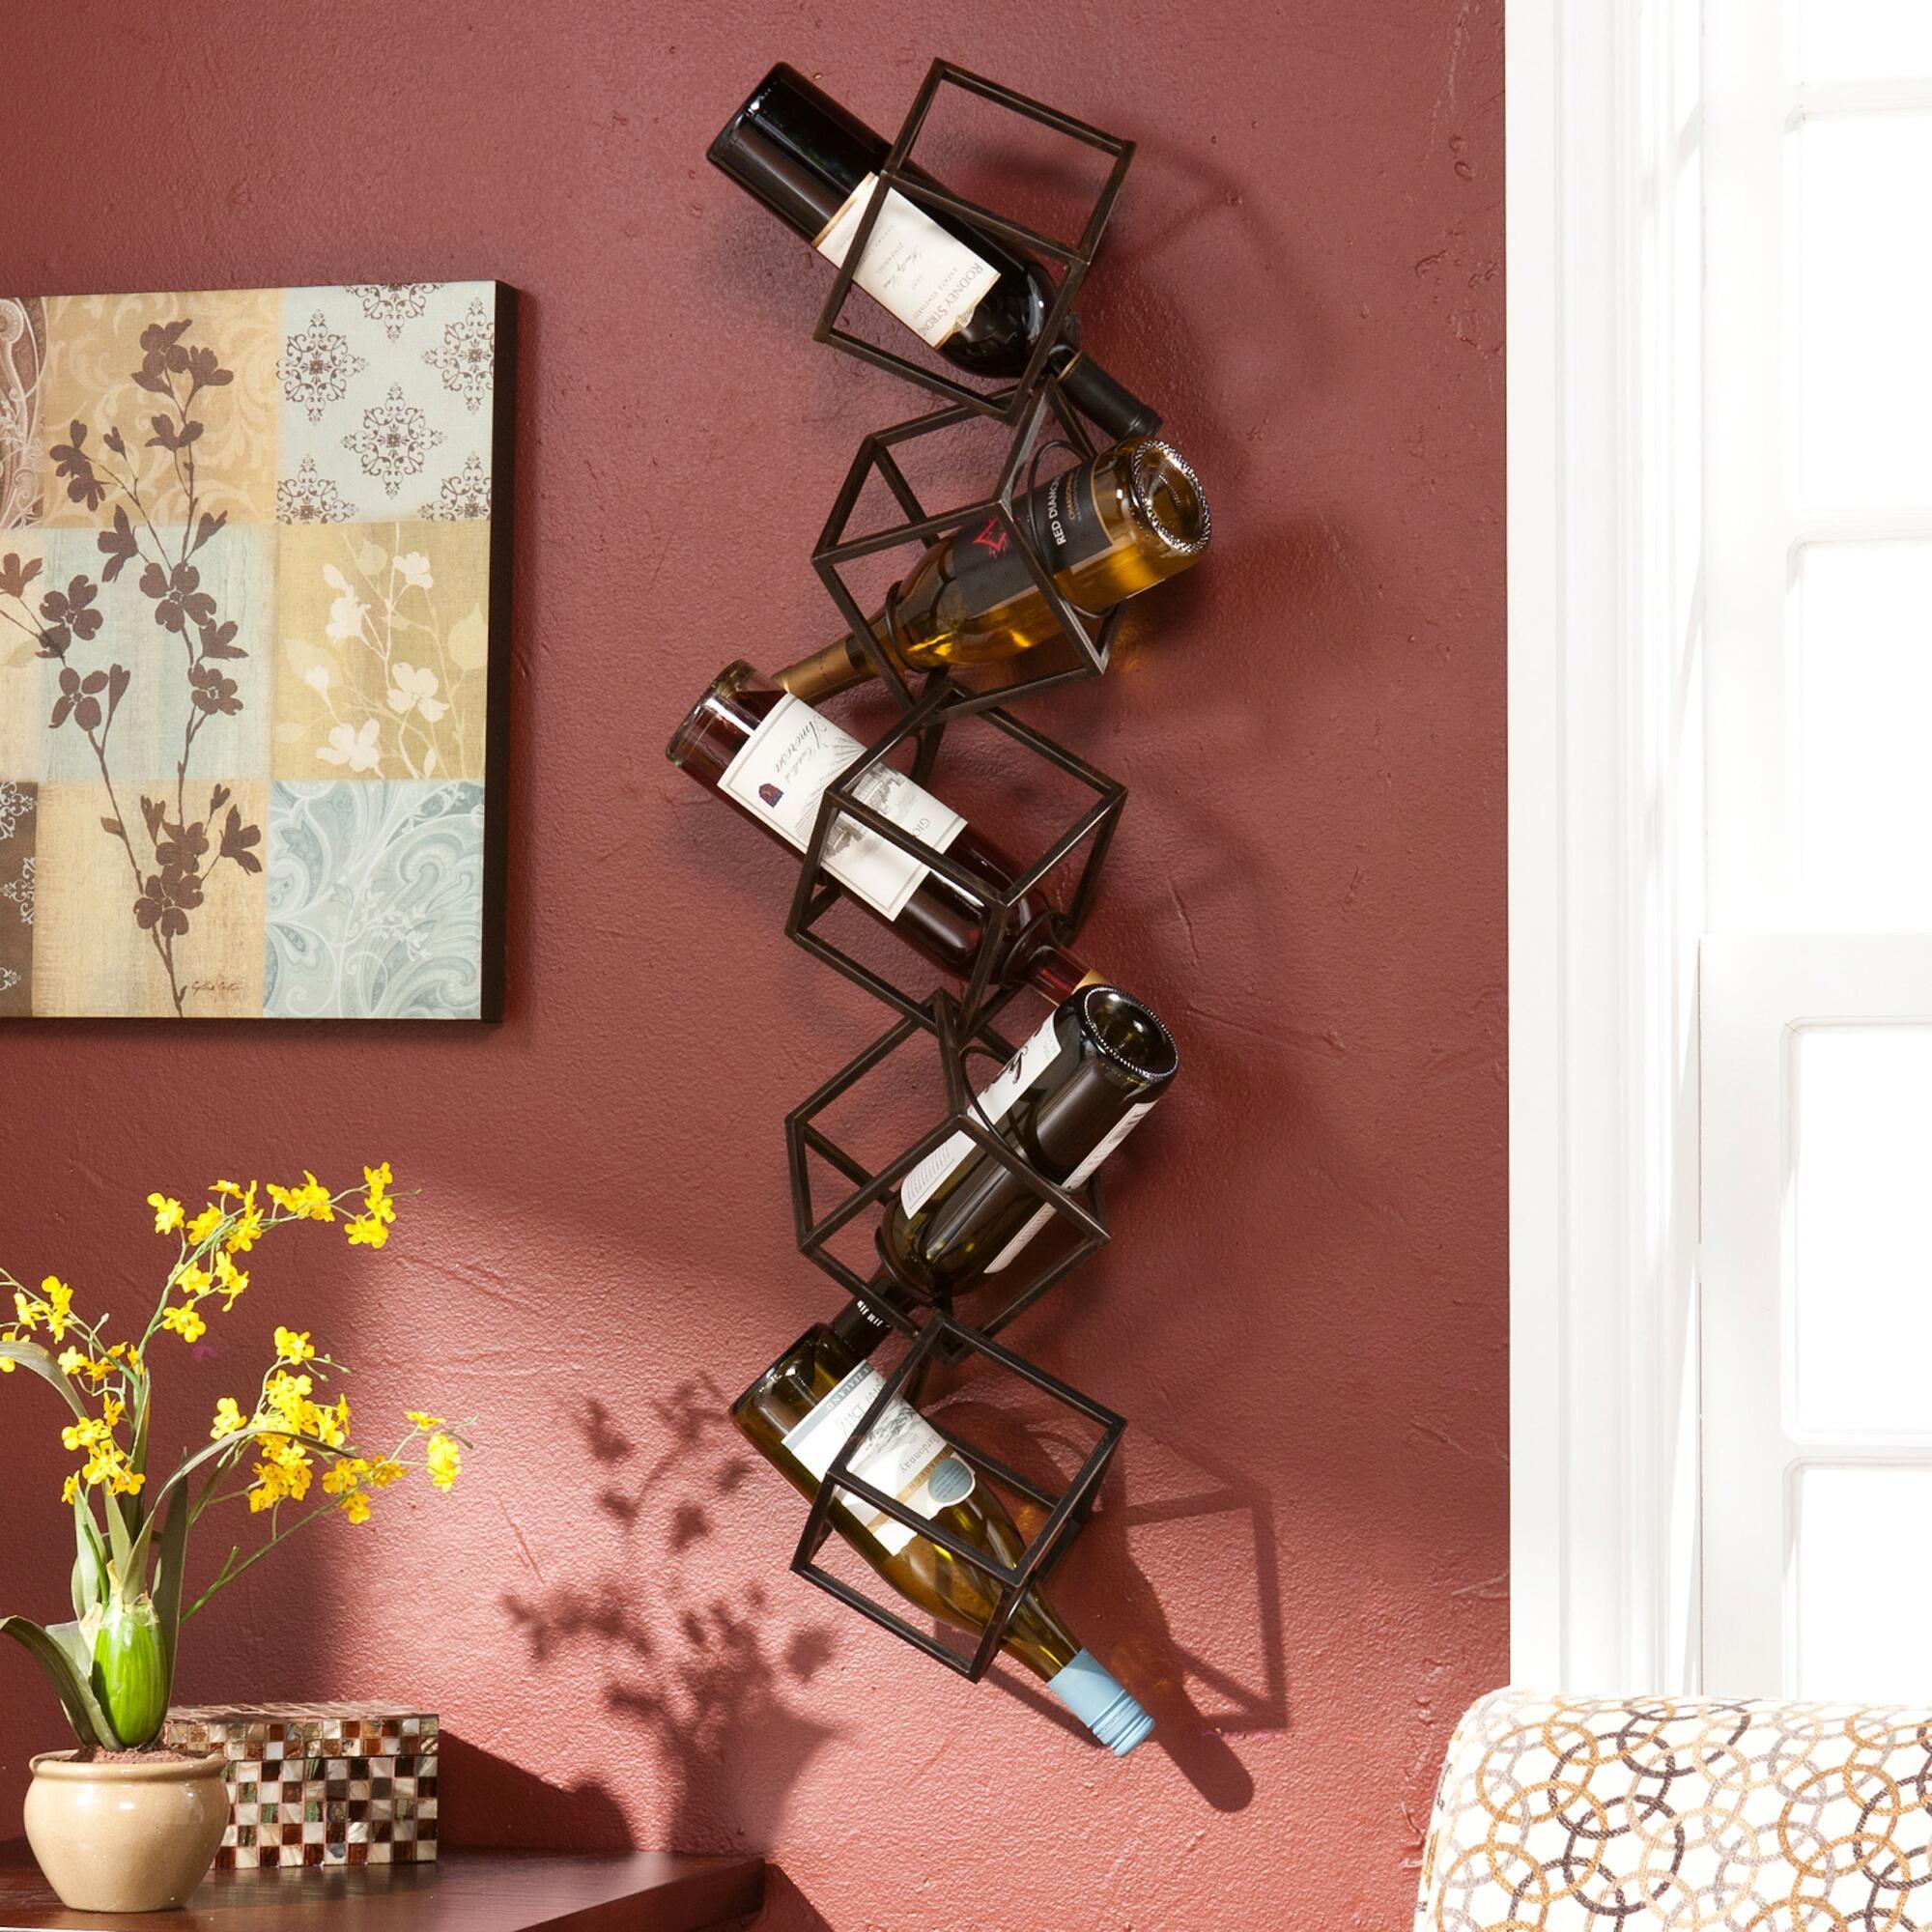 The Cube Wall Mount Wine Storage Is Both Sculptural And Functional Composed Of Five 3 D Geometric Abstract C Parede Garrafa Armazenamento De Vinho Porta Vinho